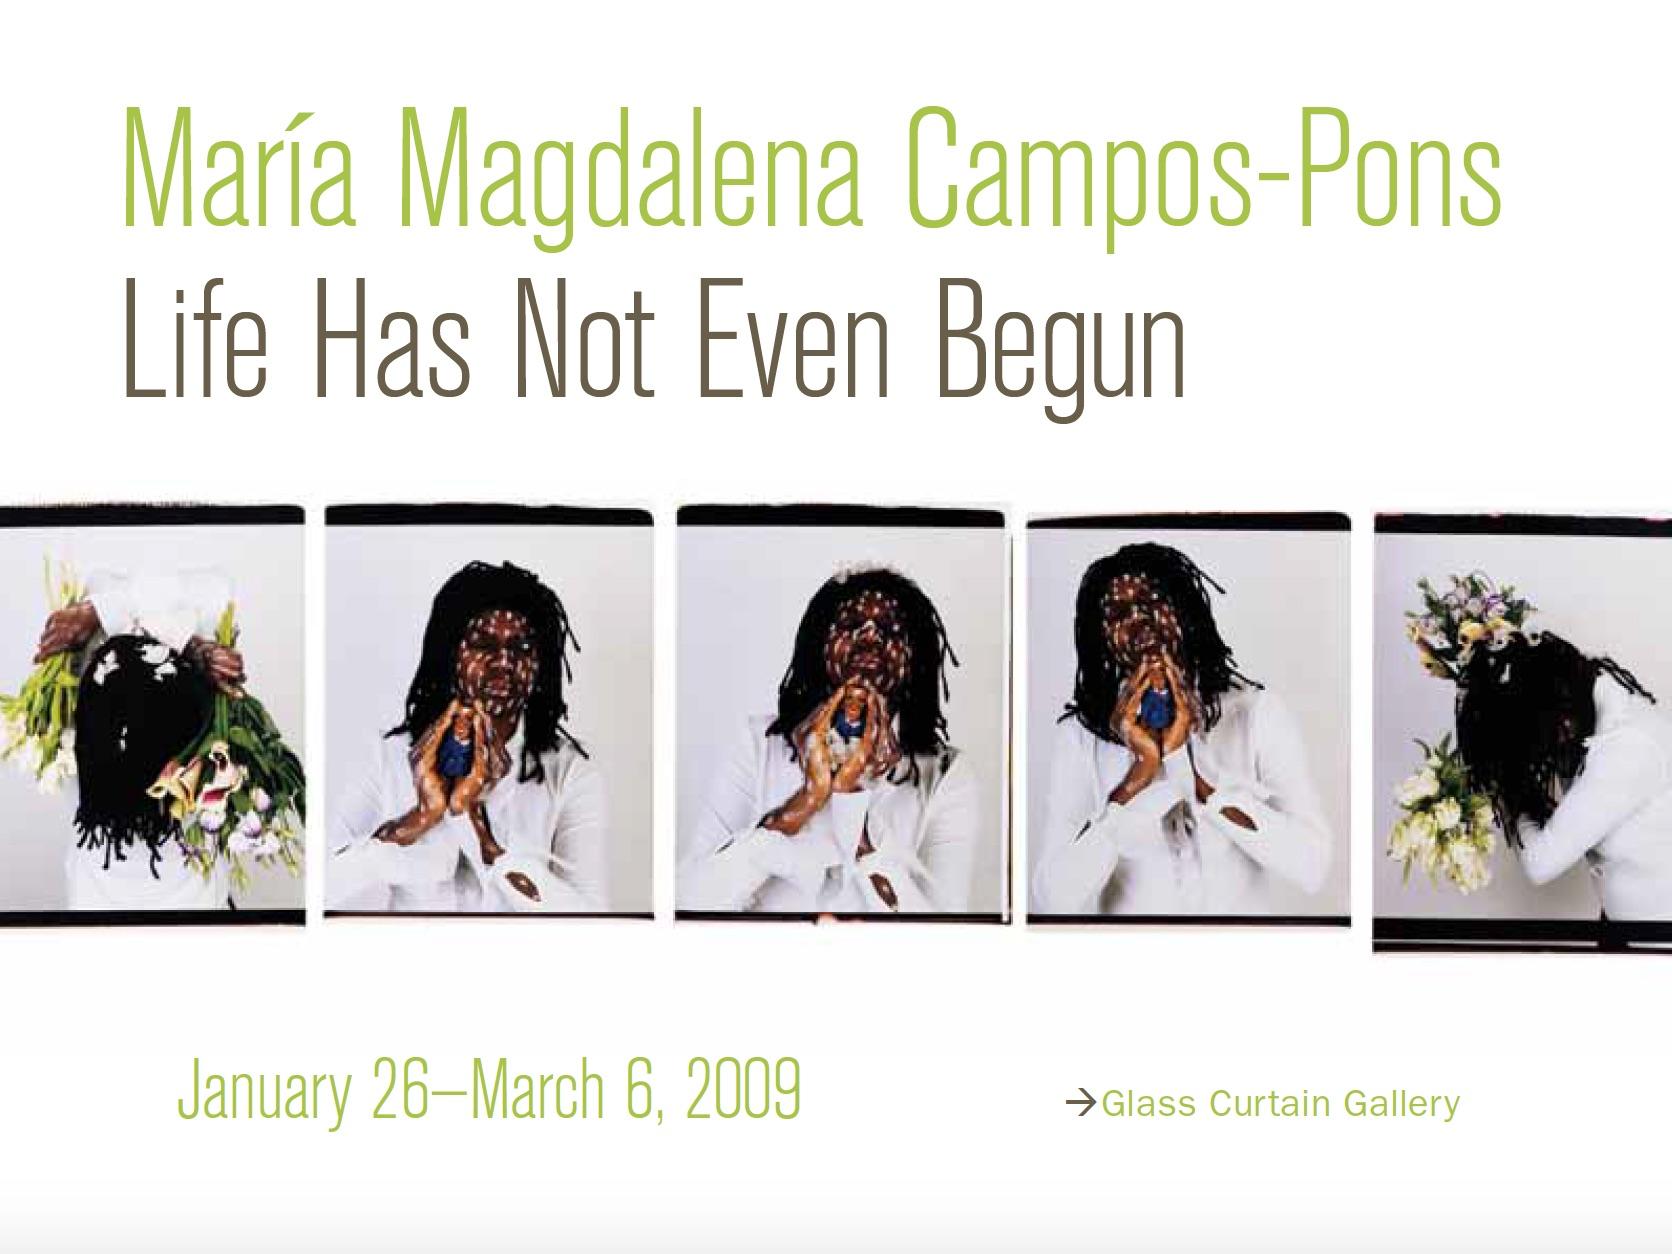 Maria Magdalena Campos-Pons: Life Has Not Even Begun